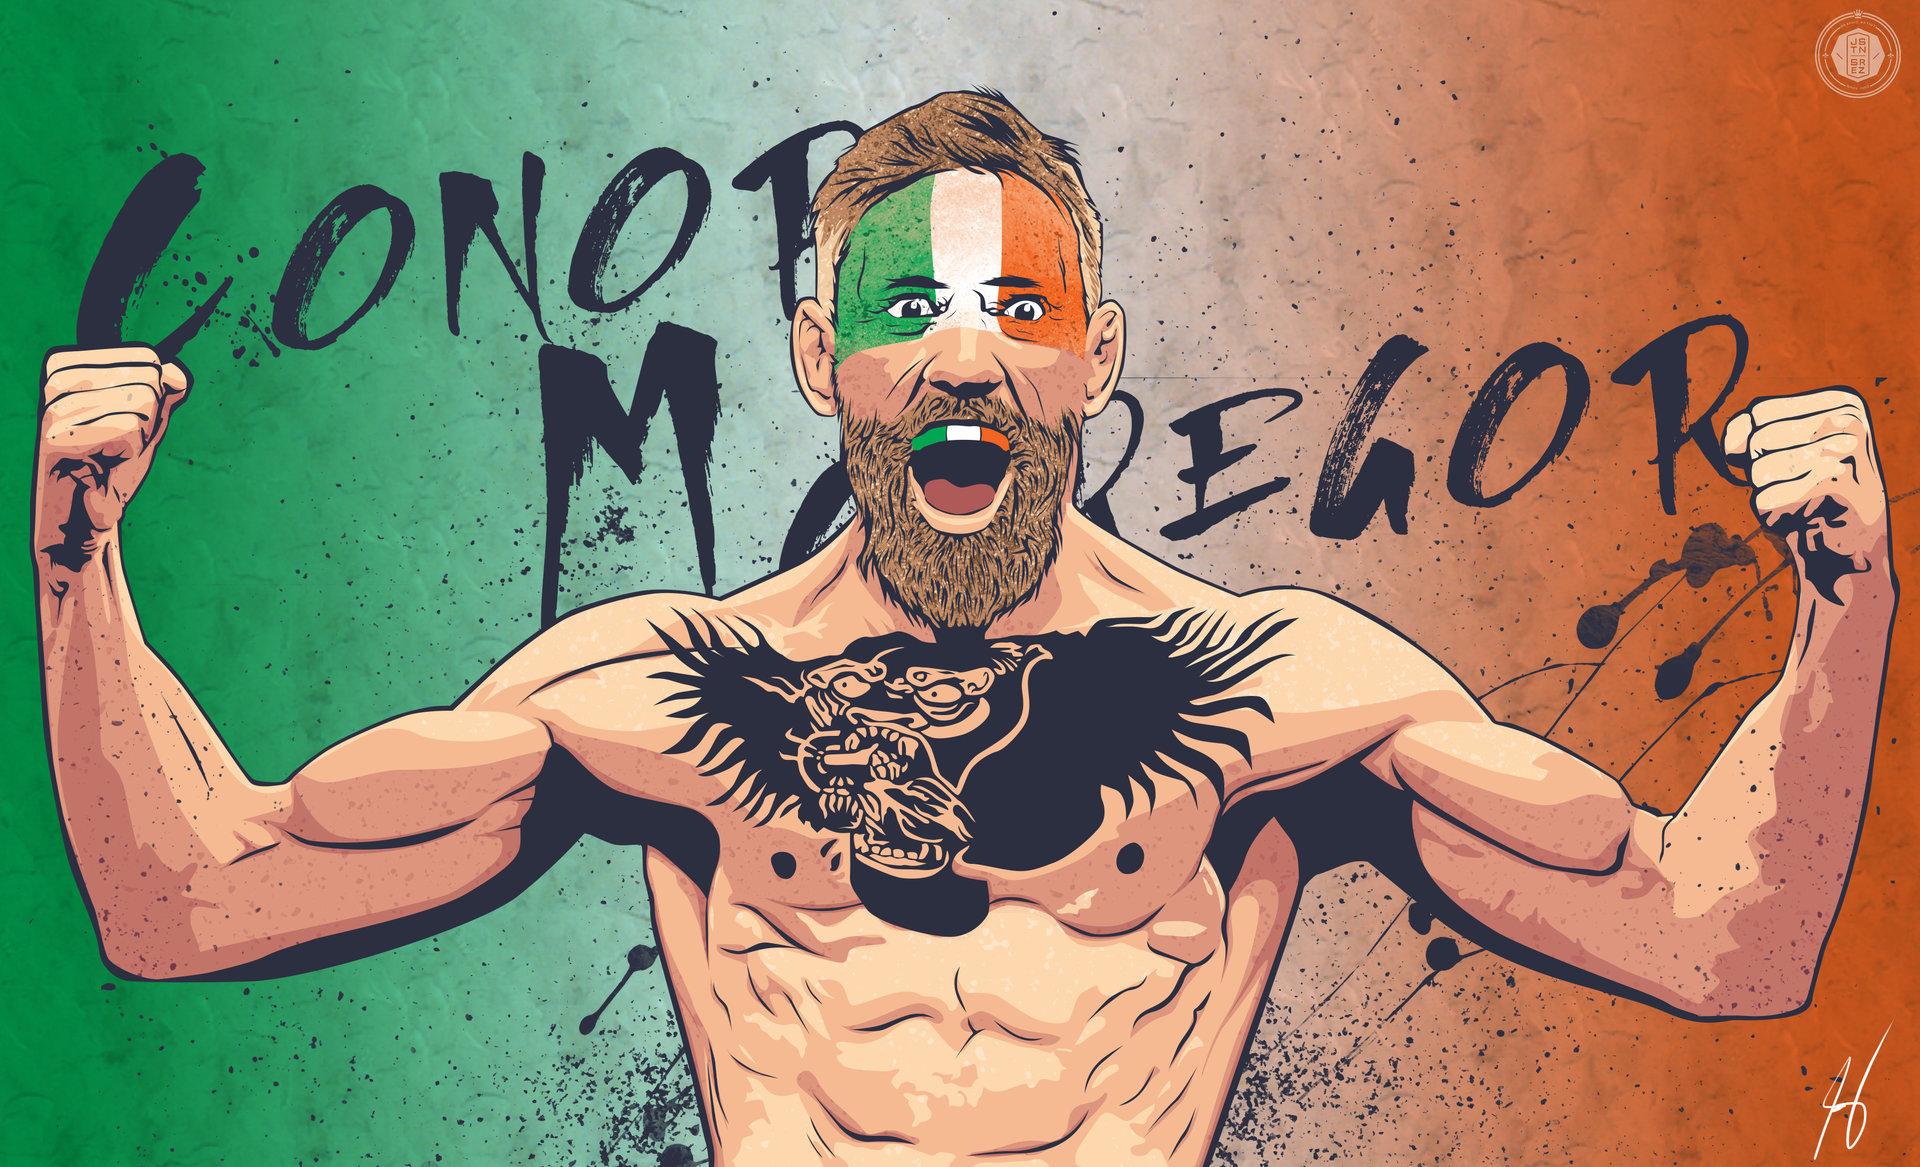 Conor McGregor Wallpapers HQ